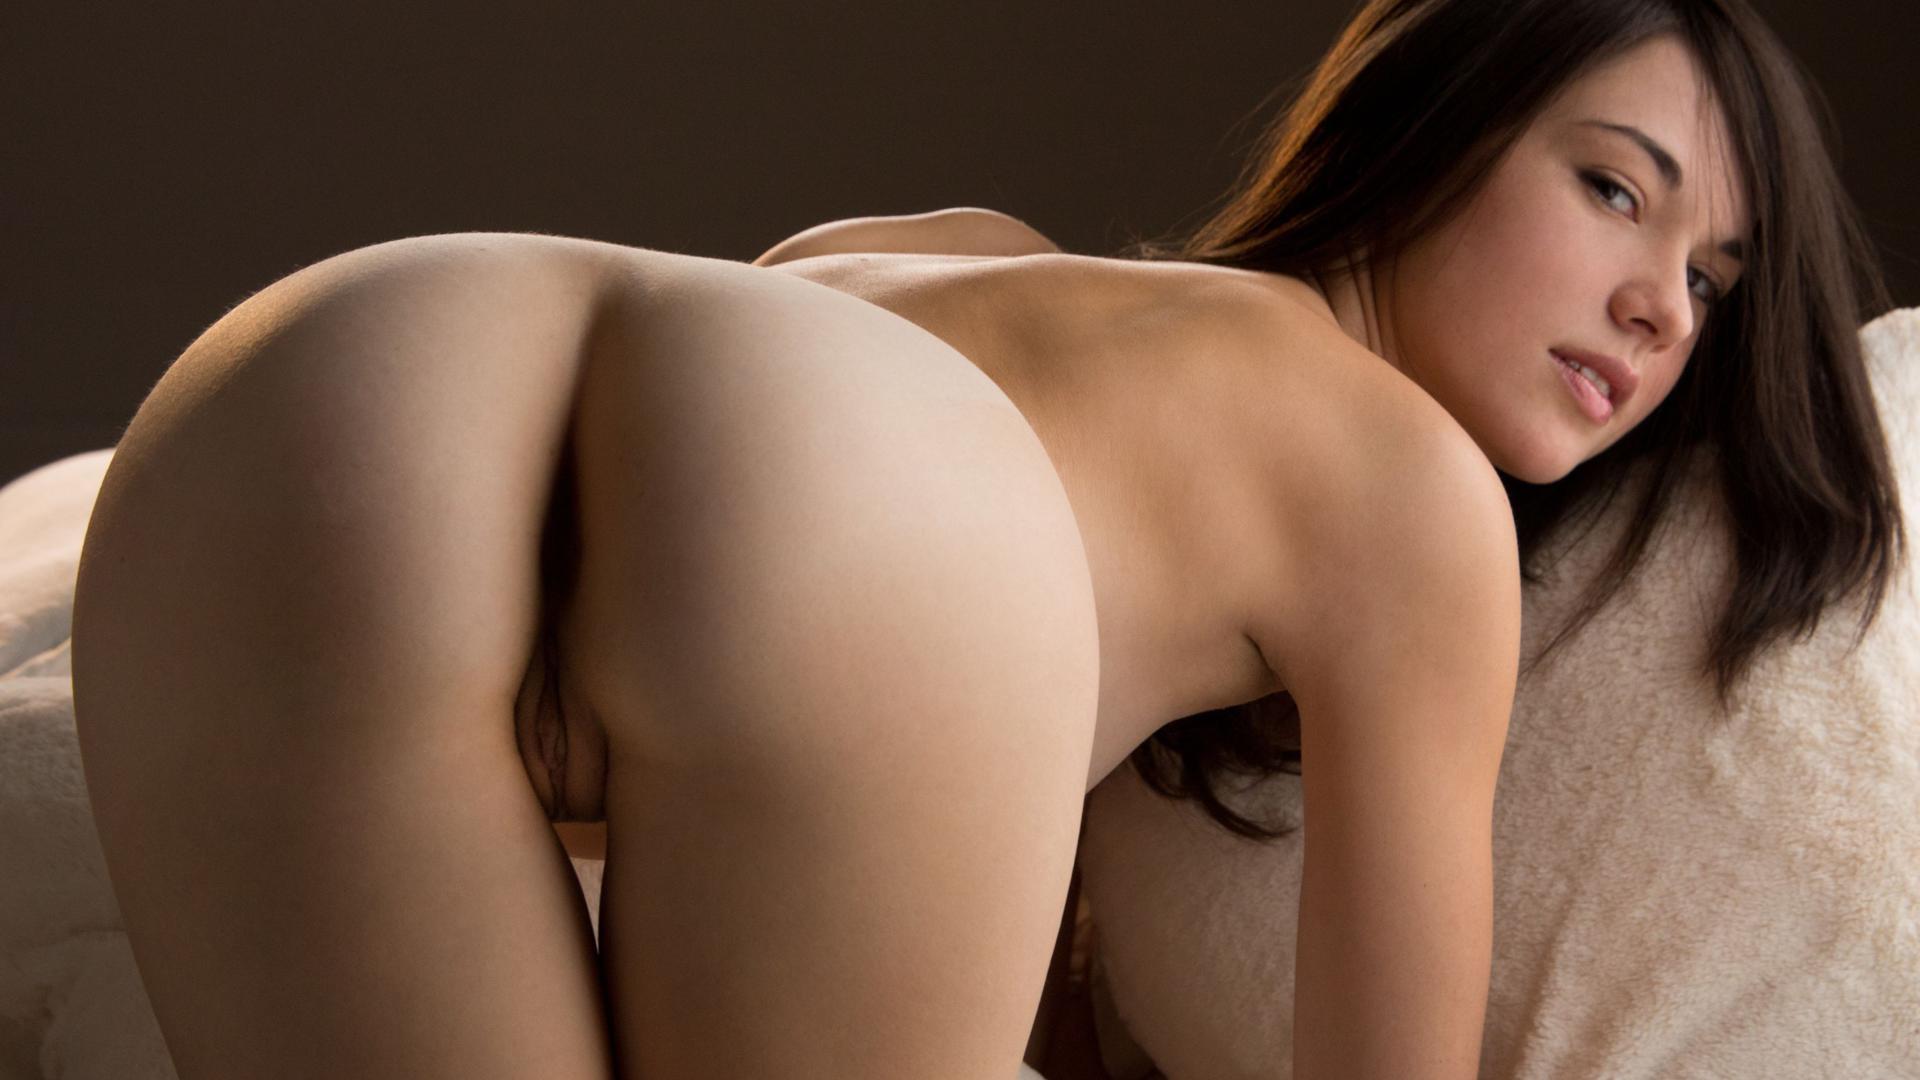 Emily grey ass